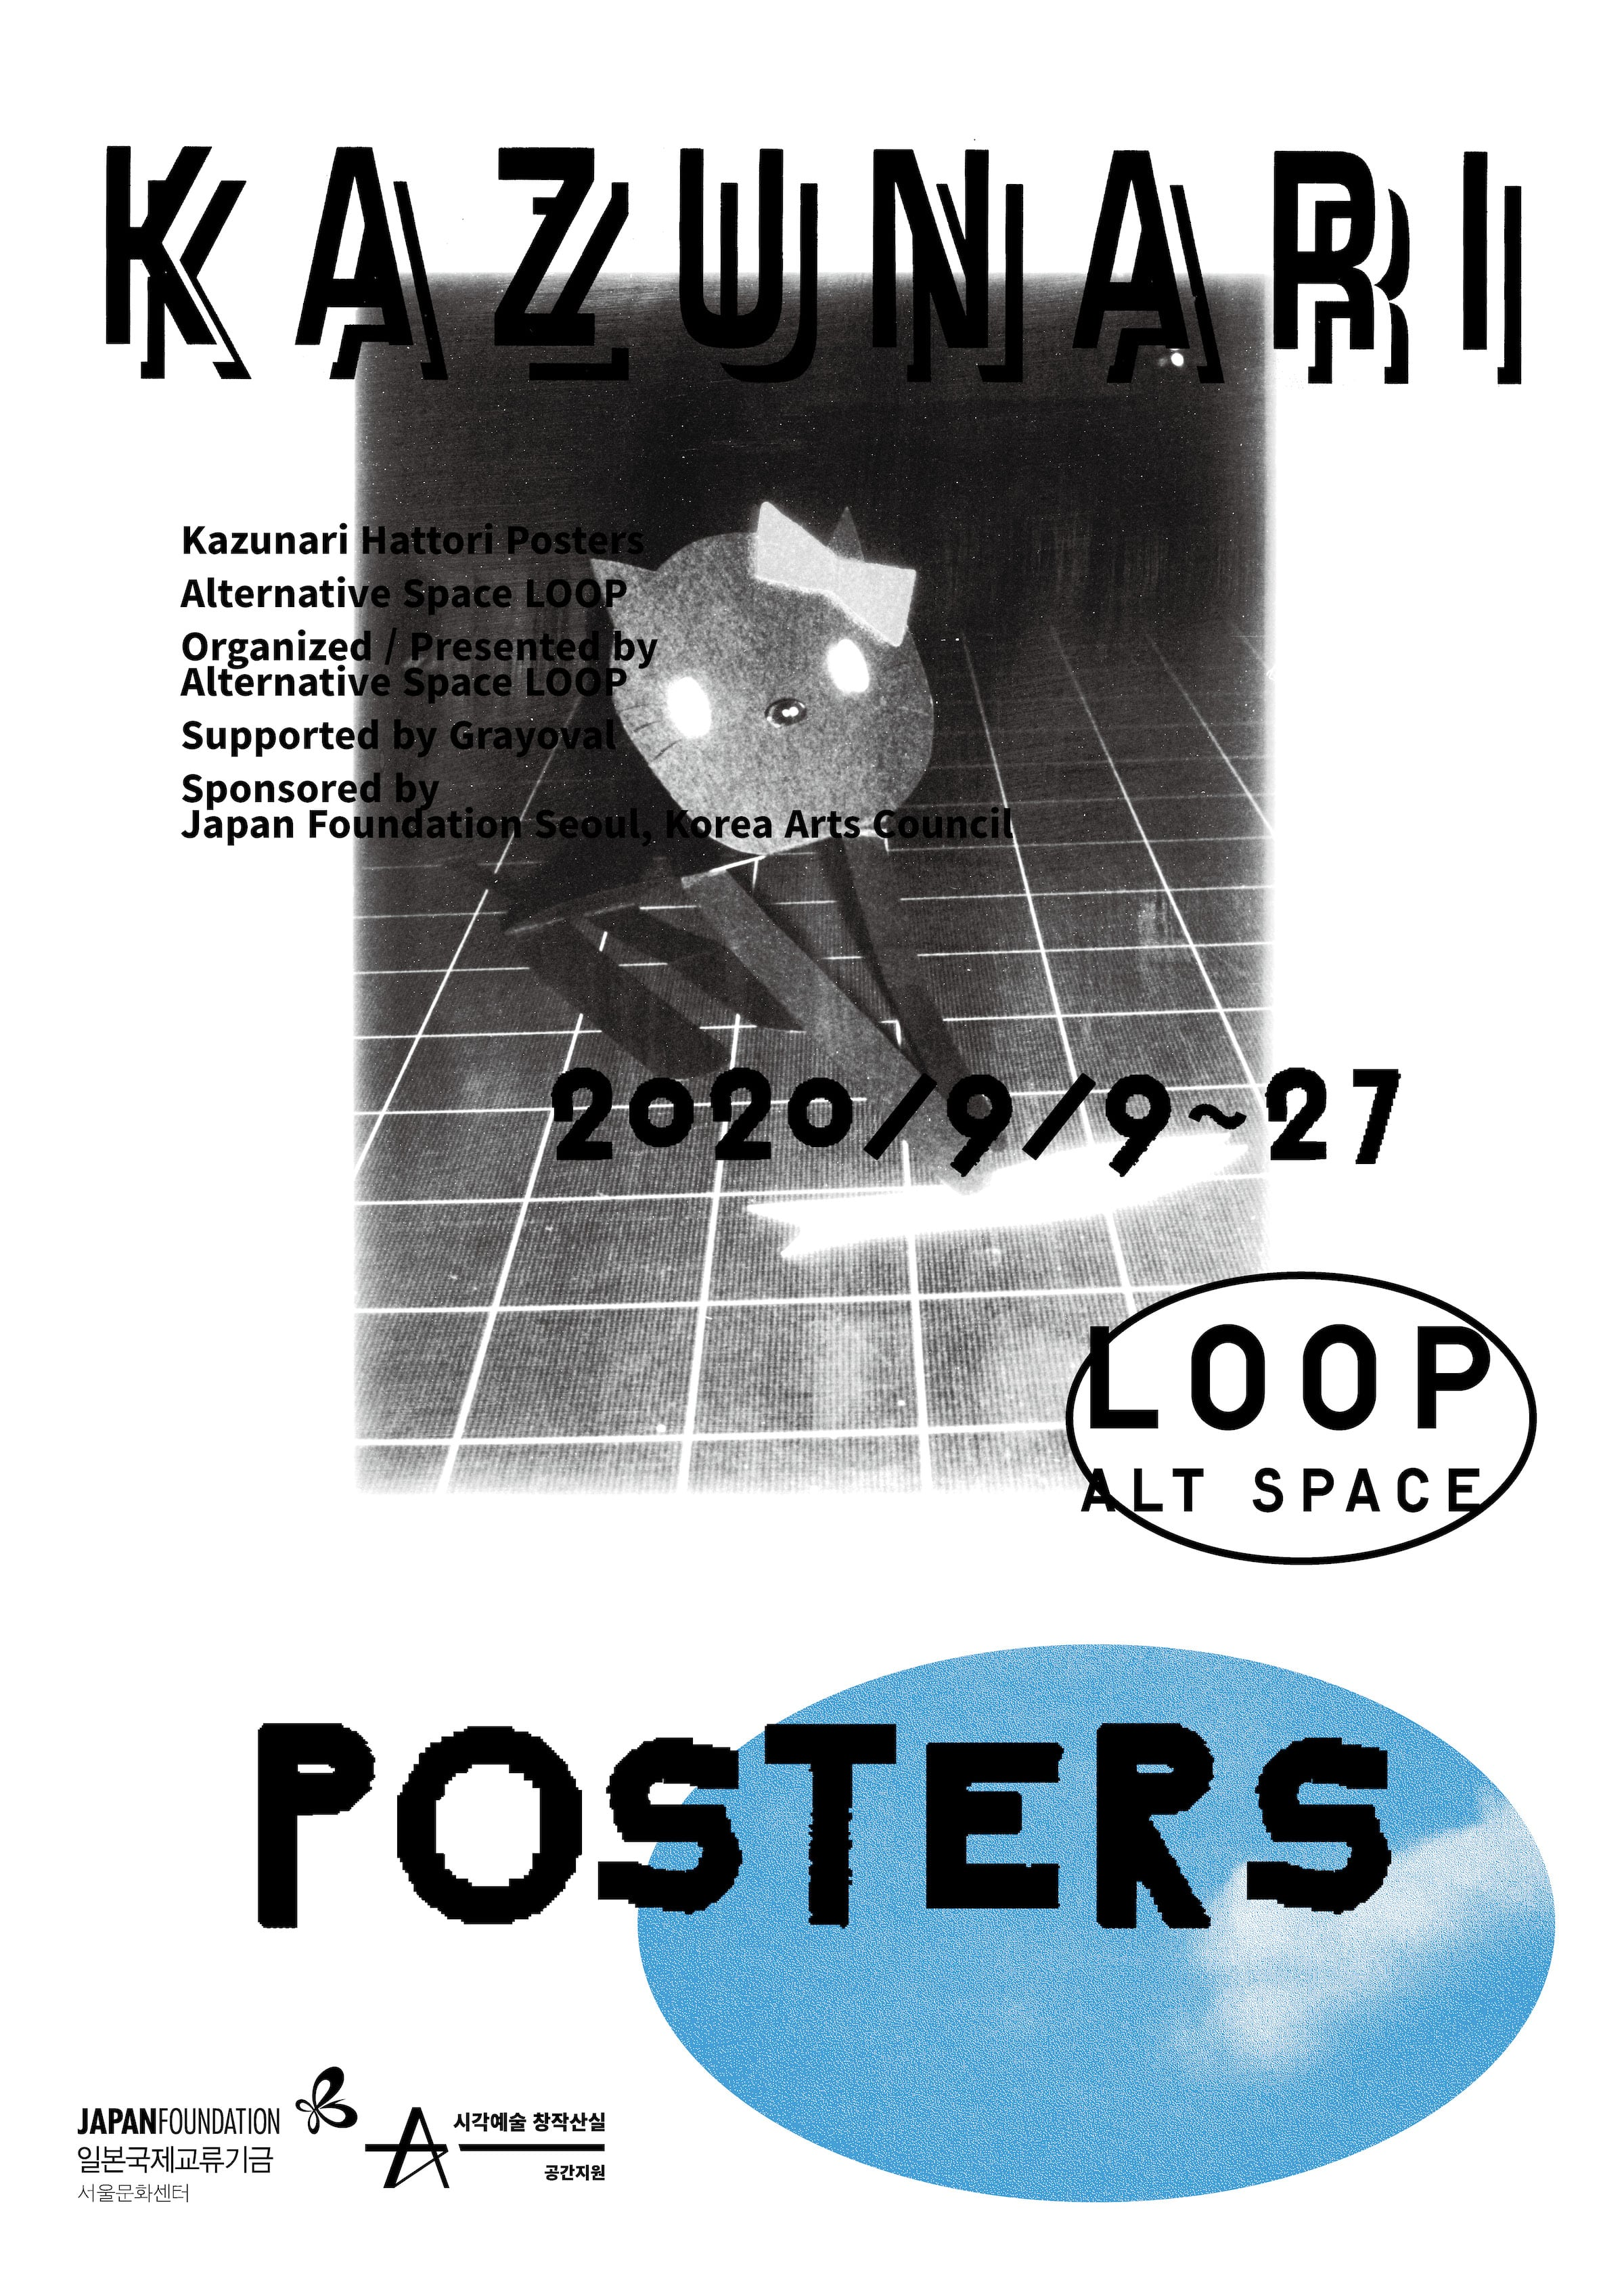 Kazunari Hattori Posters